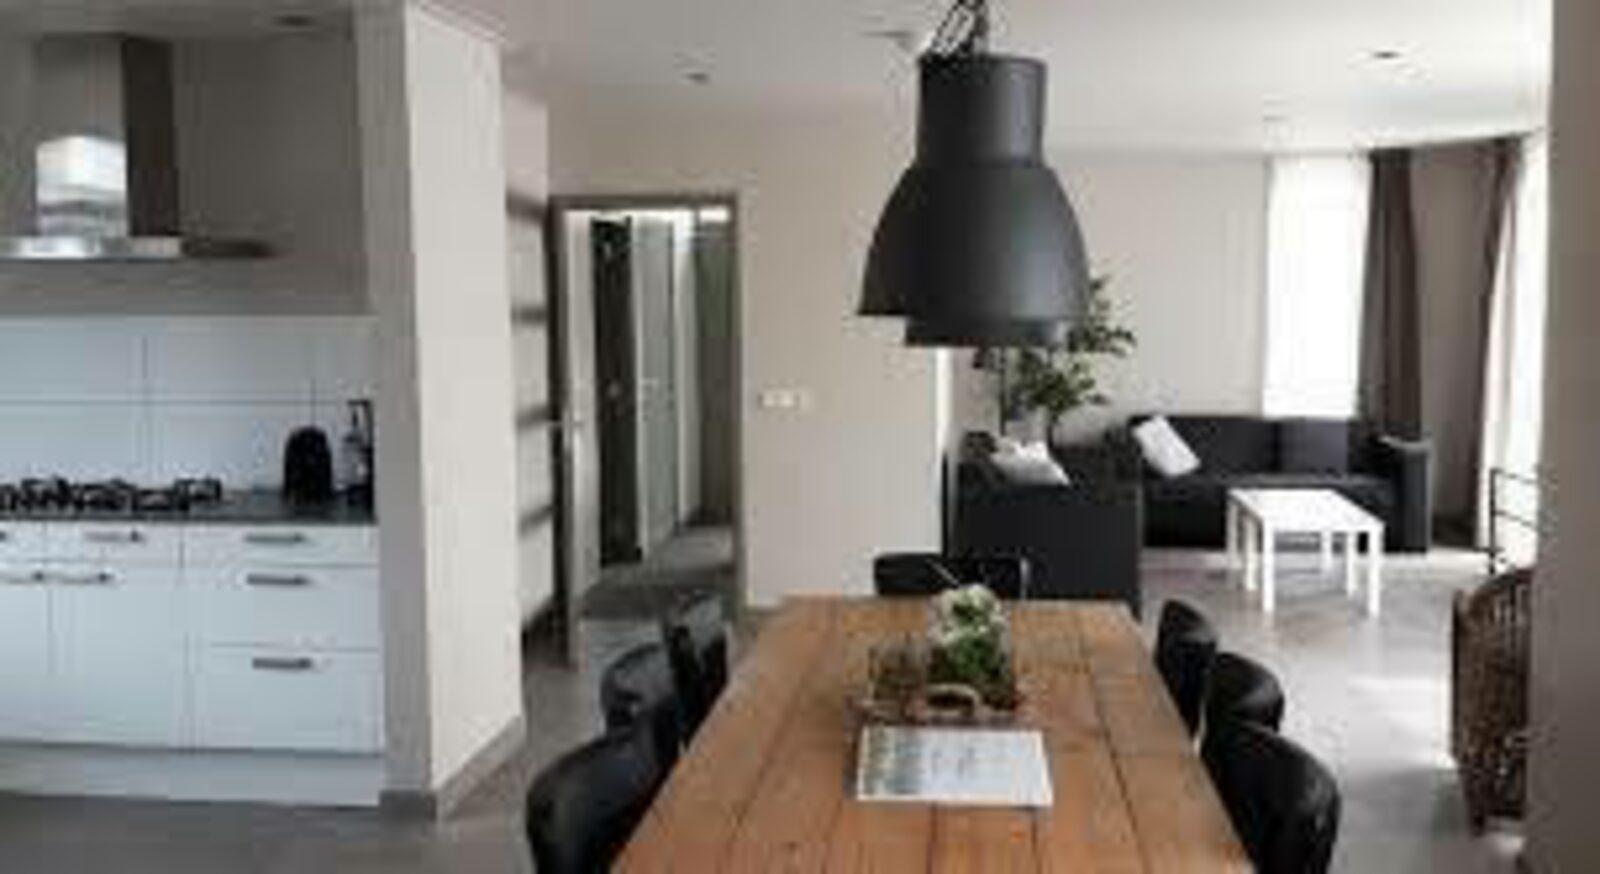 Familiehuis - Oostkapelsweg 32 | Serooskerke 'Reiger'